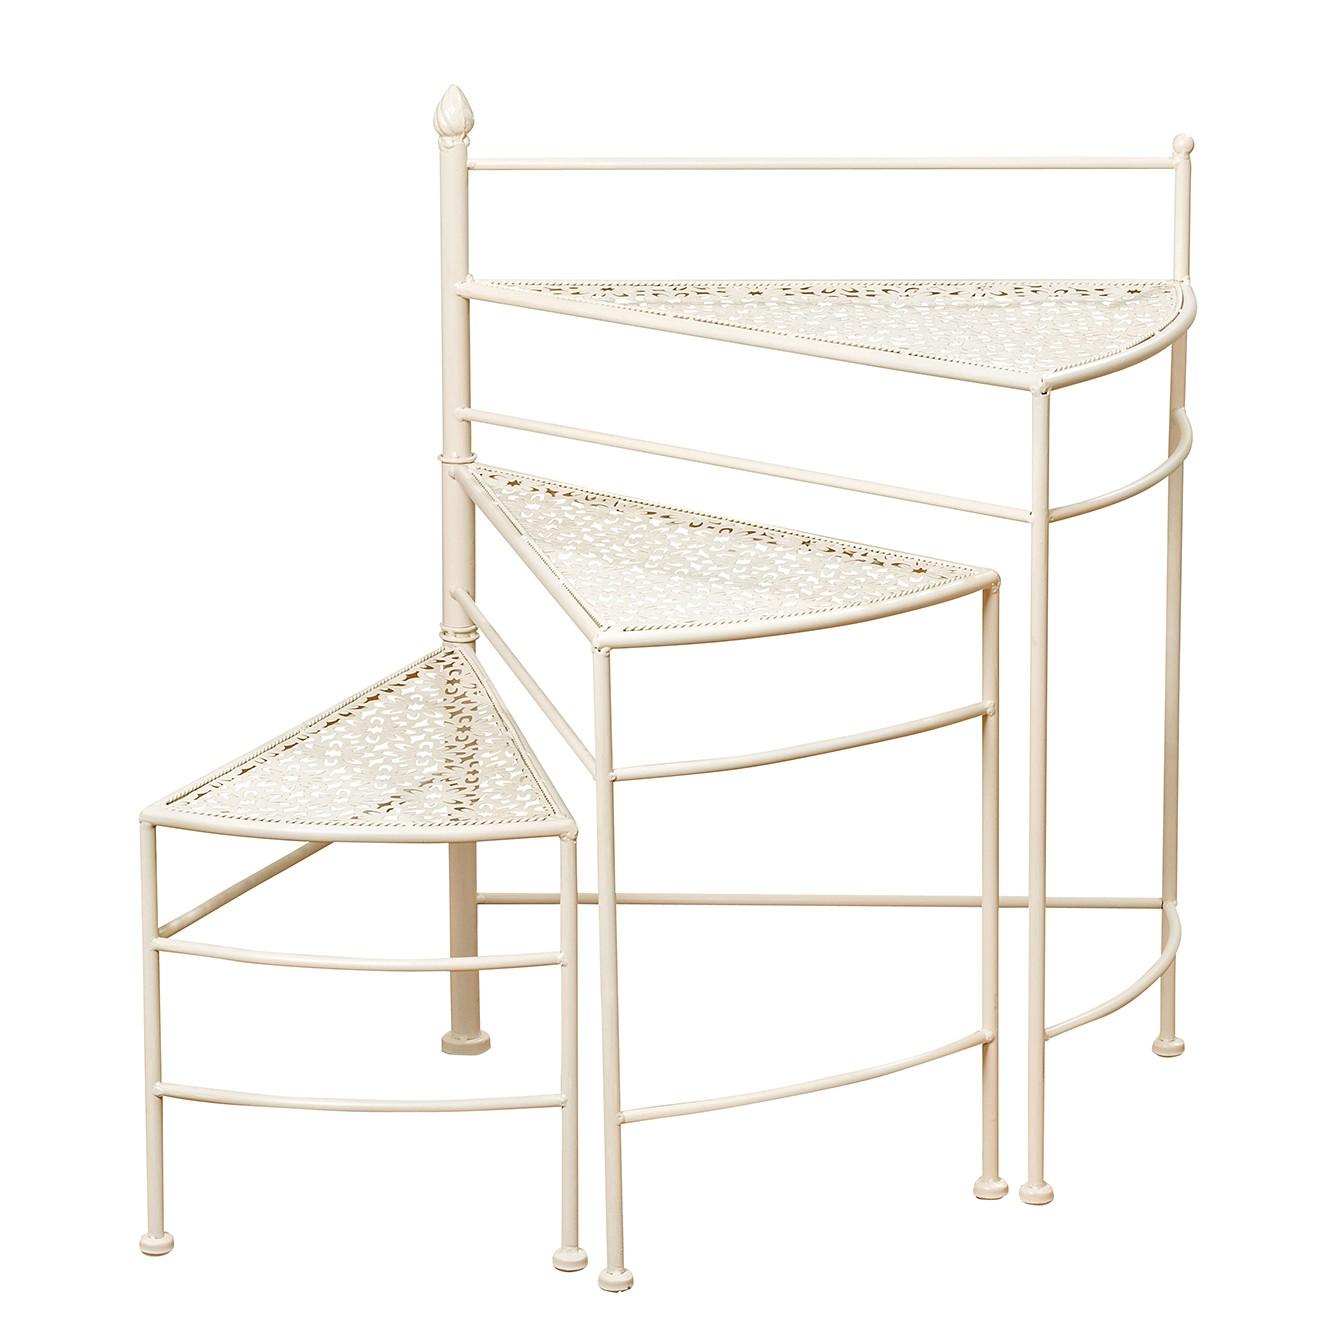 porte plantes estelle fer cr me maison belfort meubles en ligne. Black Bedroom Furniture Sets. Home Design Ideas